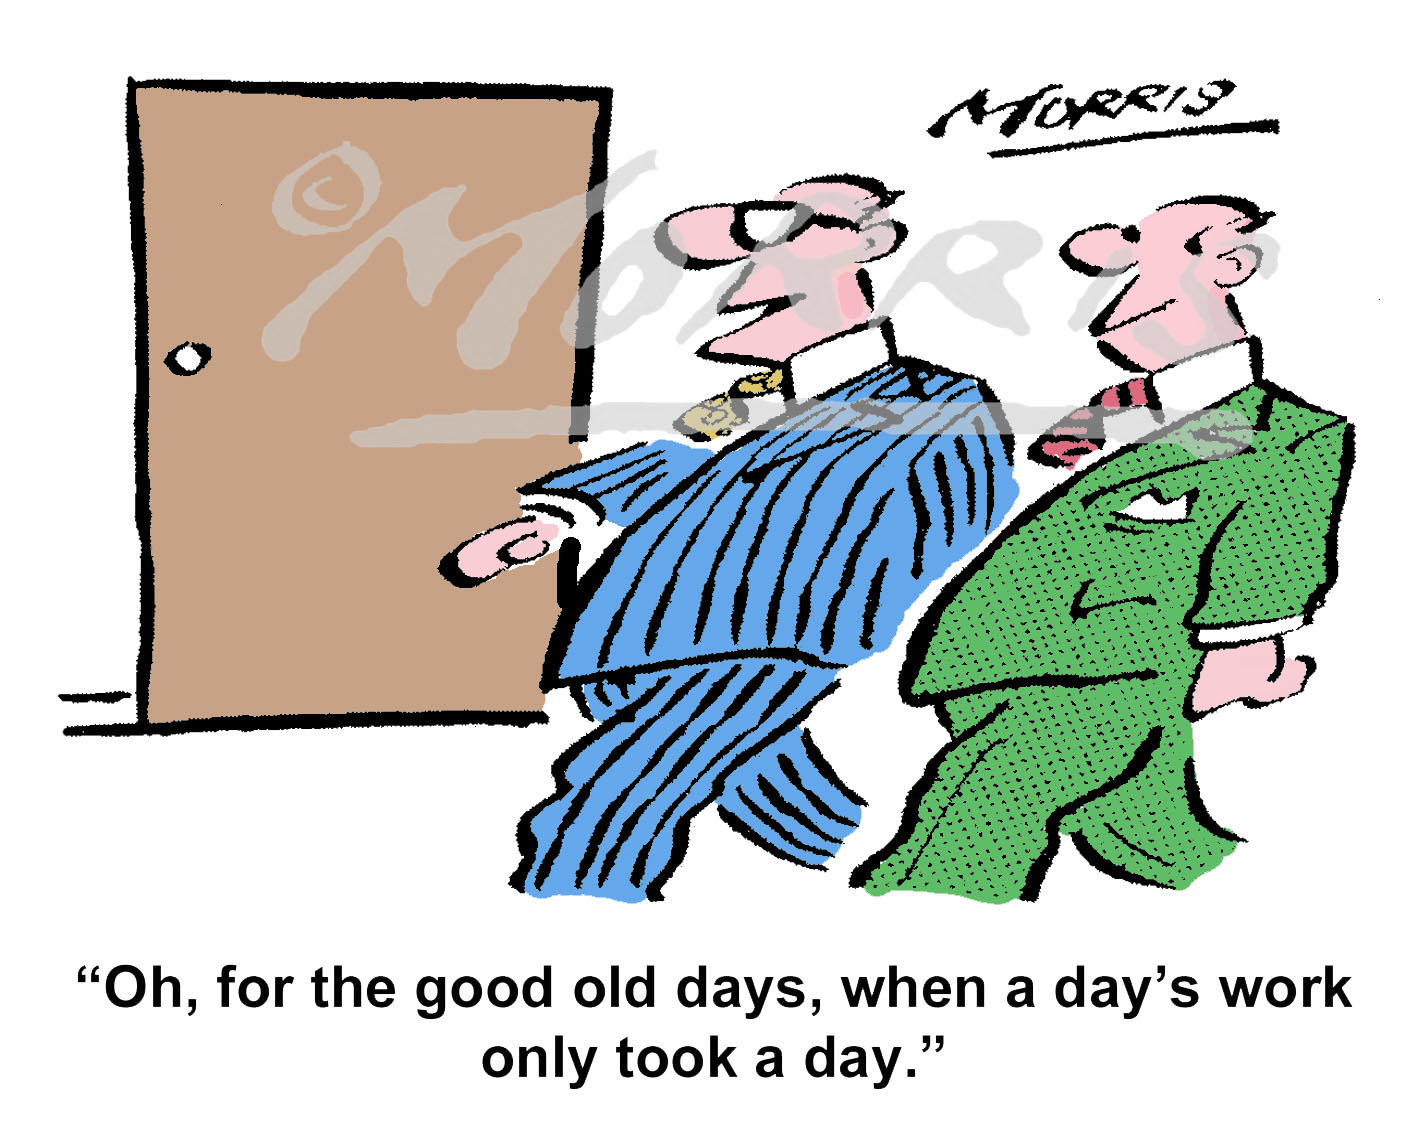 Management office business cartoon comic – Ref: 7965col